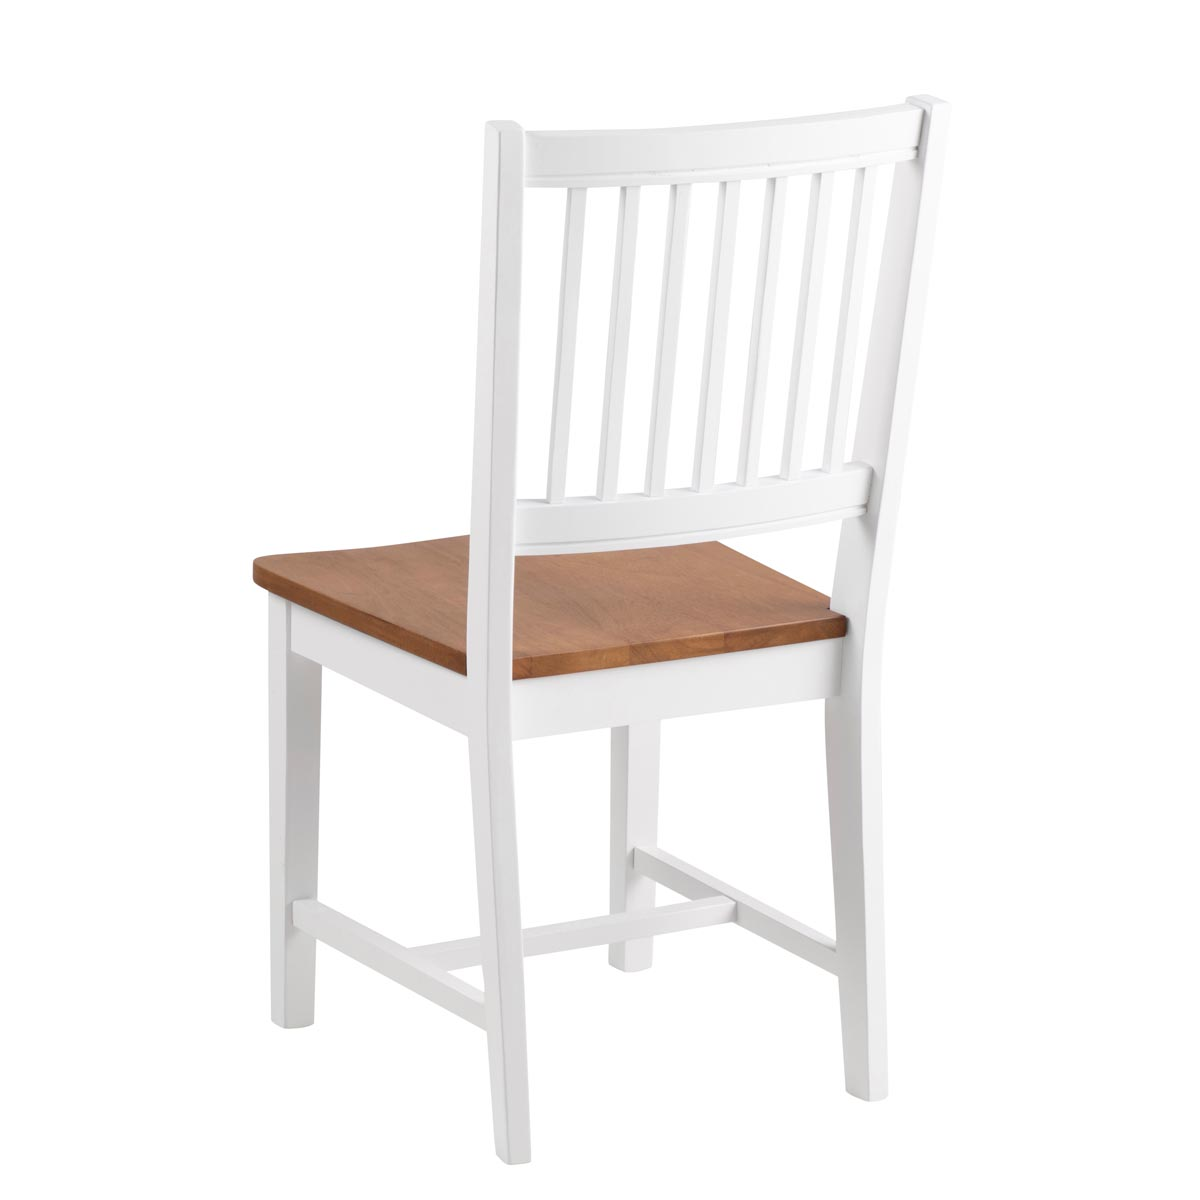 BRISBANE-stol-vinkel2